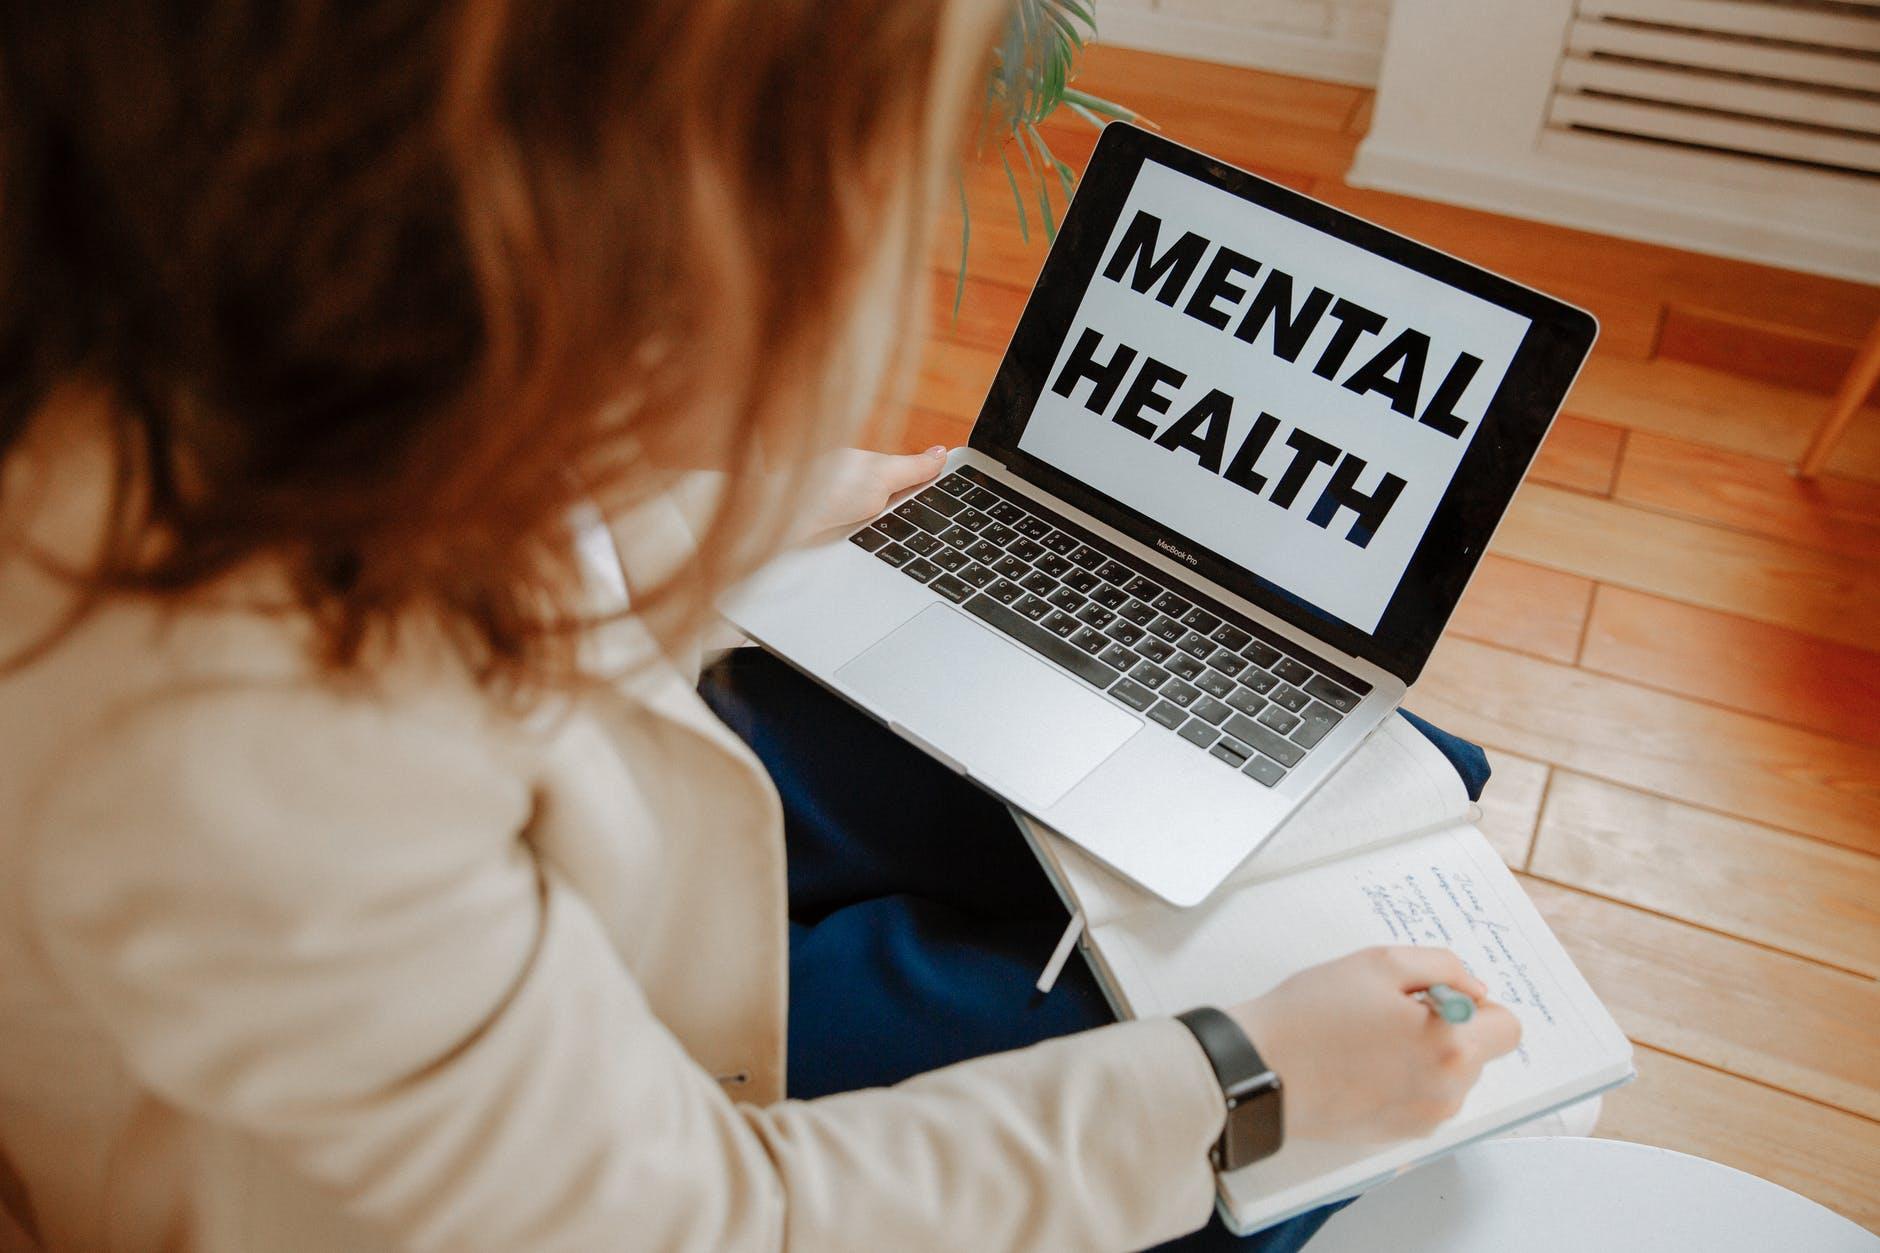 dr. alok trivedi, mental health